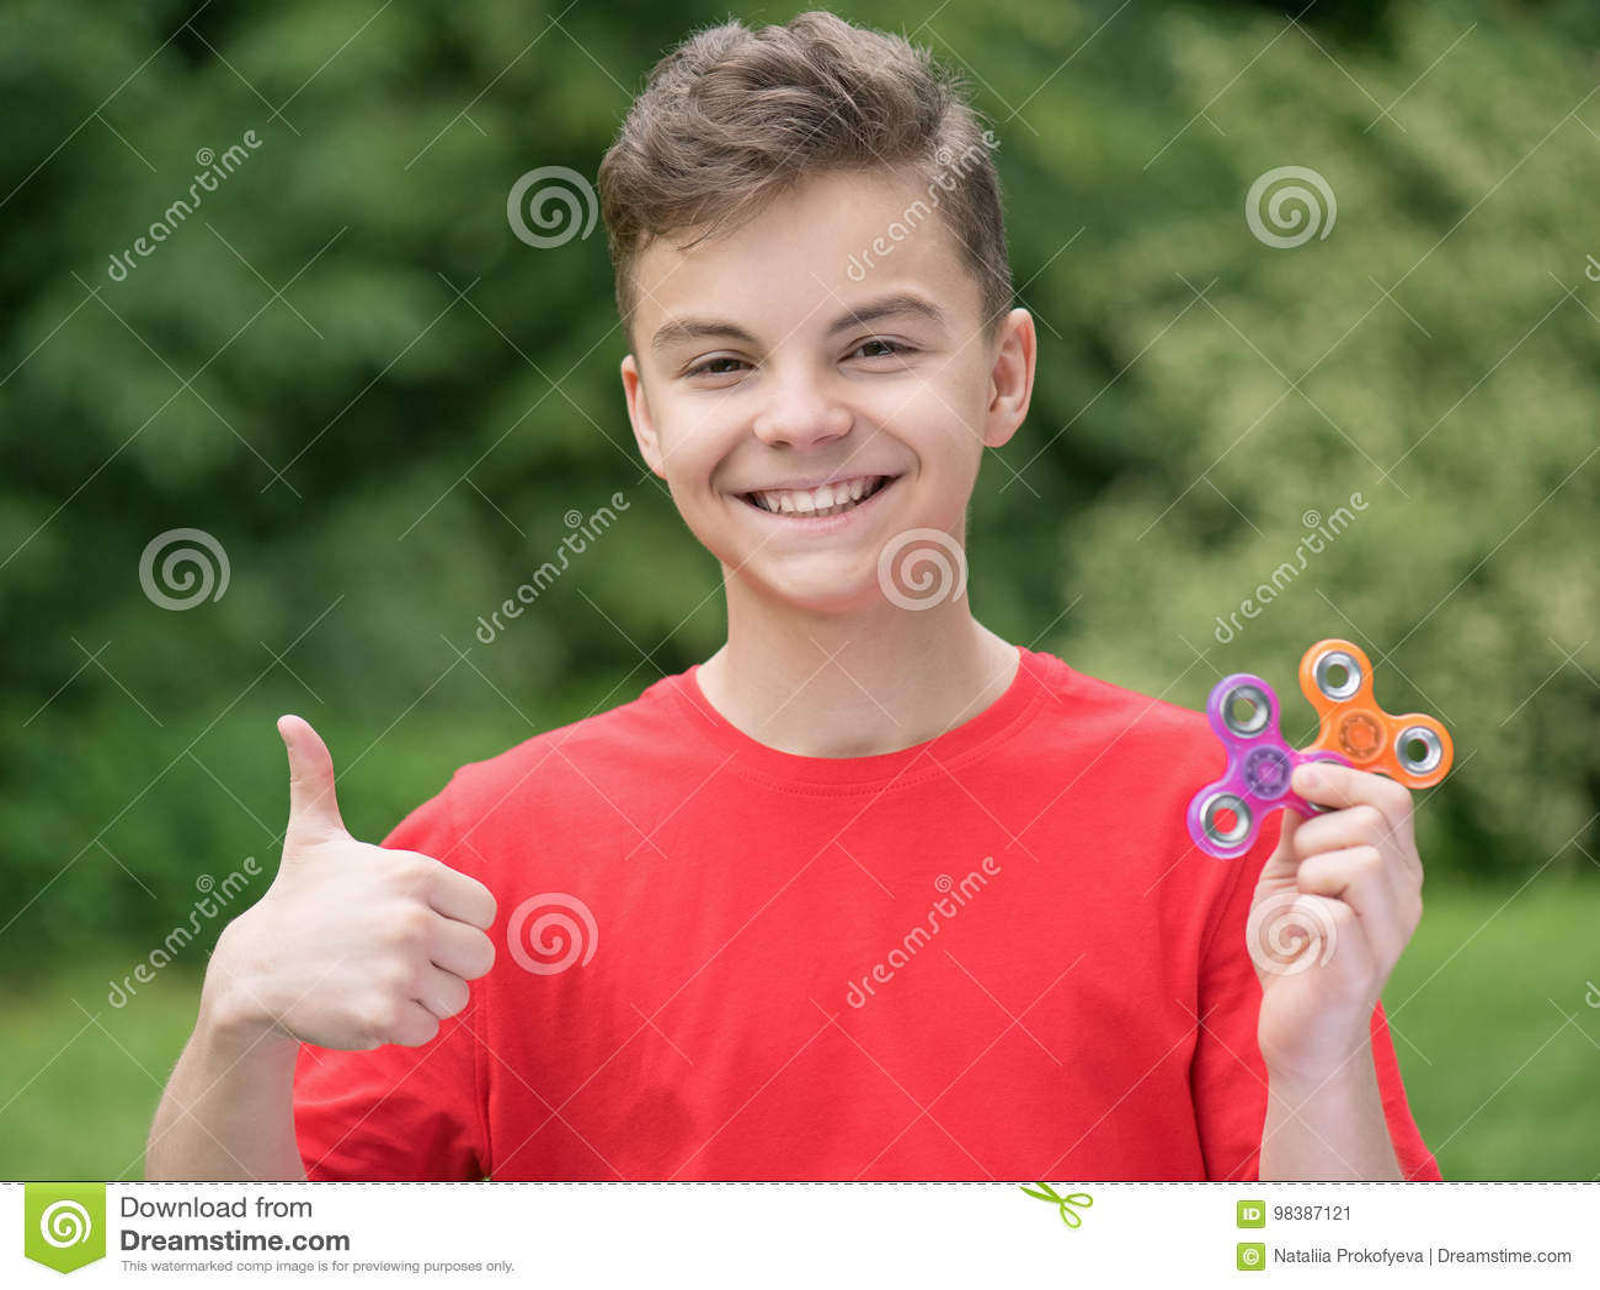 Amateur teen flashing bum